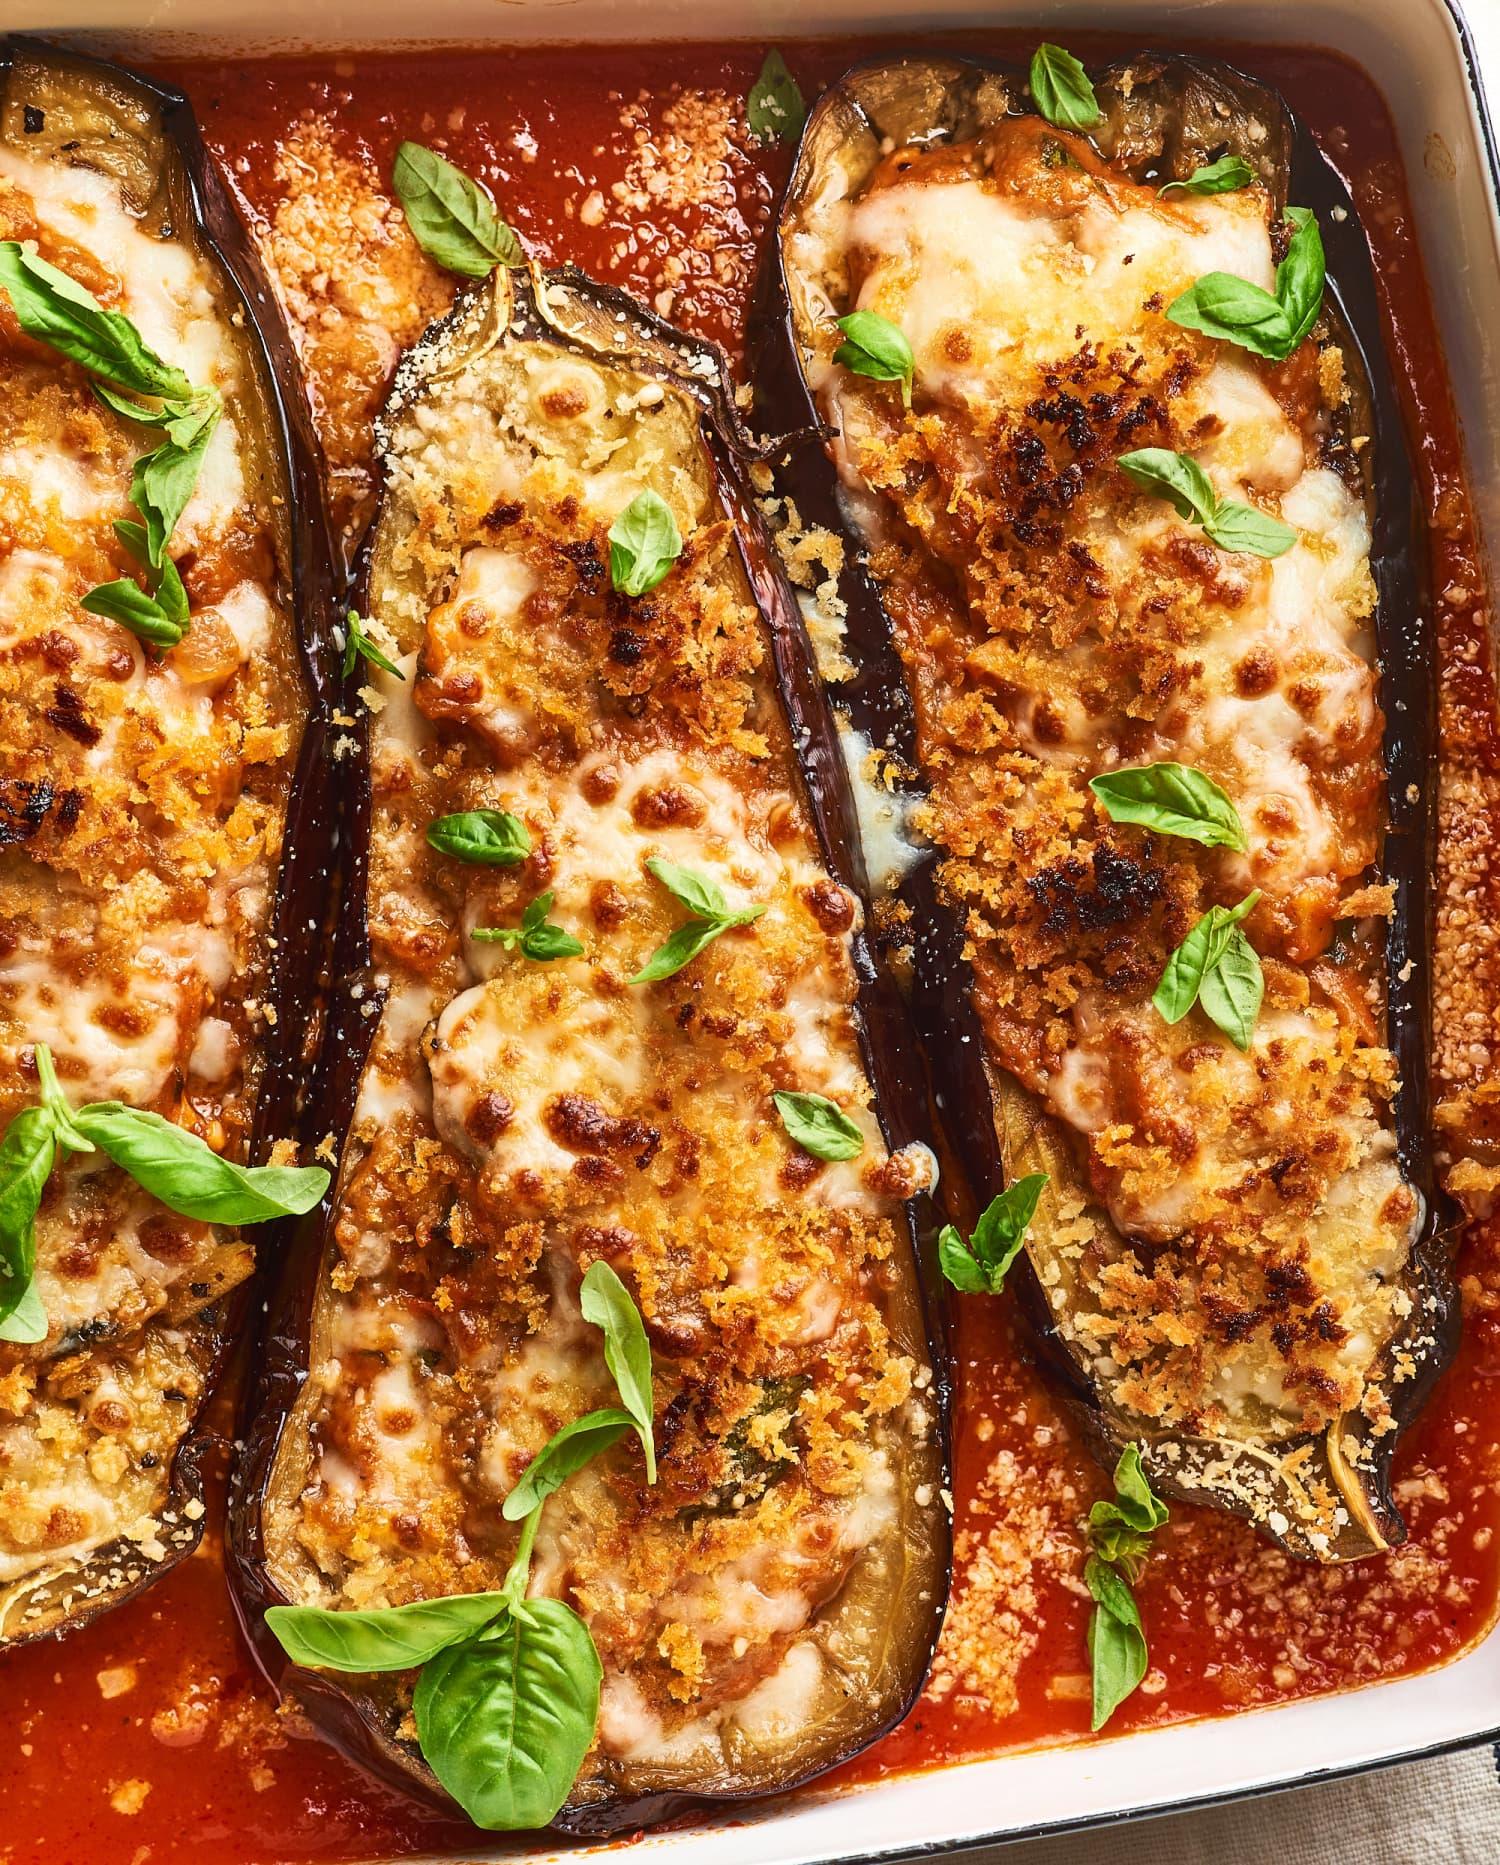 Recipe: Stuffed Eggplant Parm